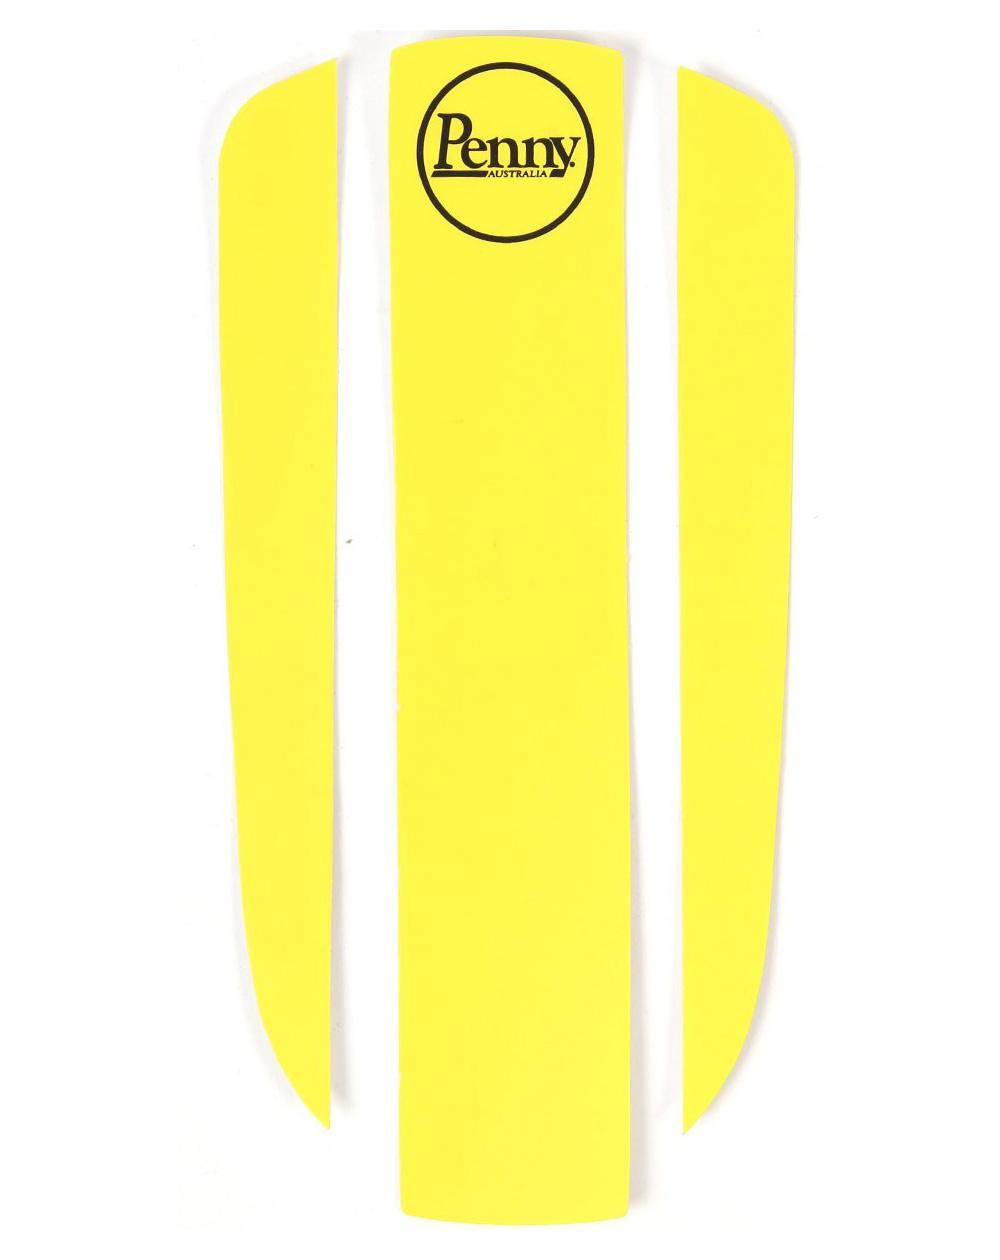 Penny Pannelli Adesivi Yellow 22-inch